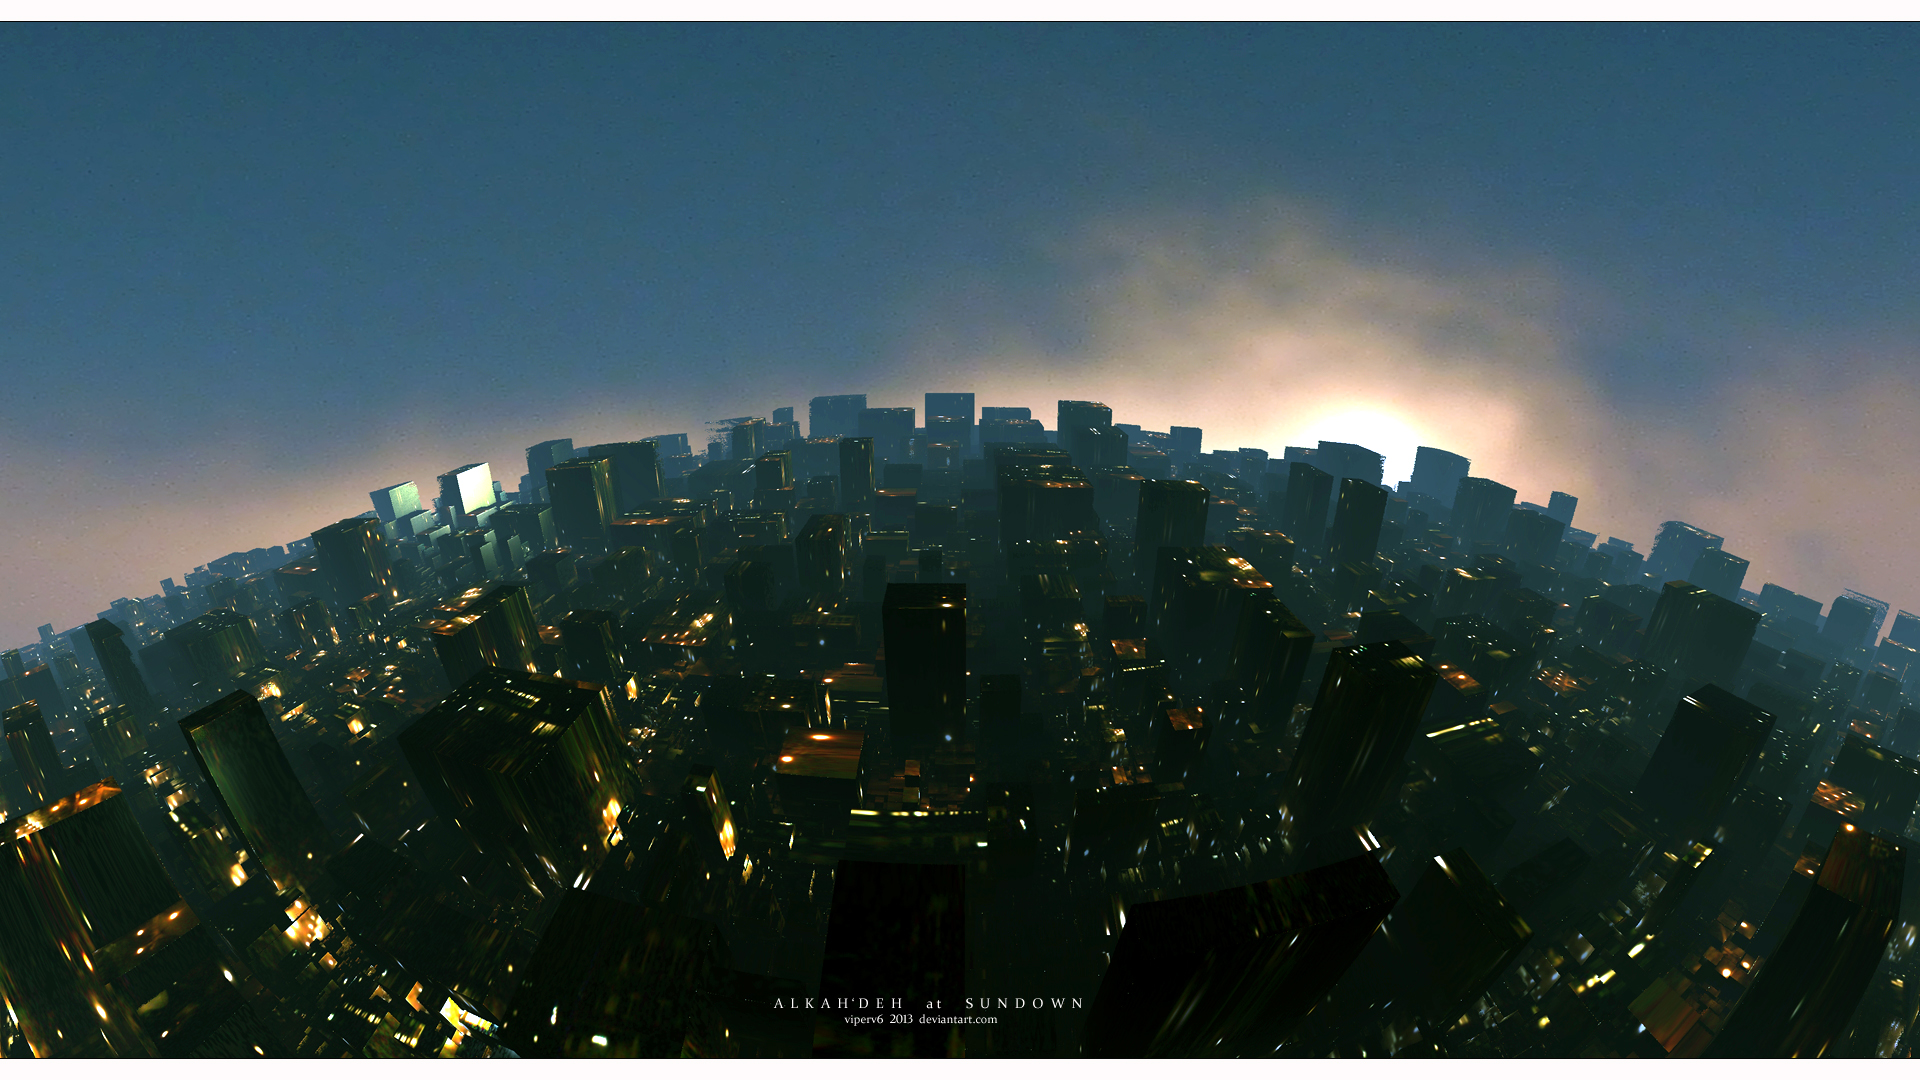 Alkah'Deh at Sundown by viperv6